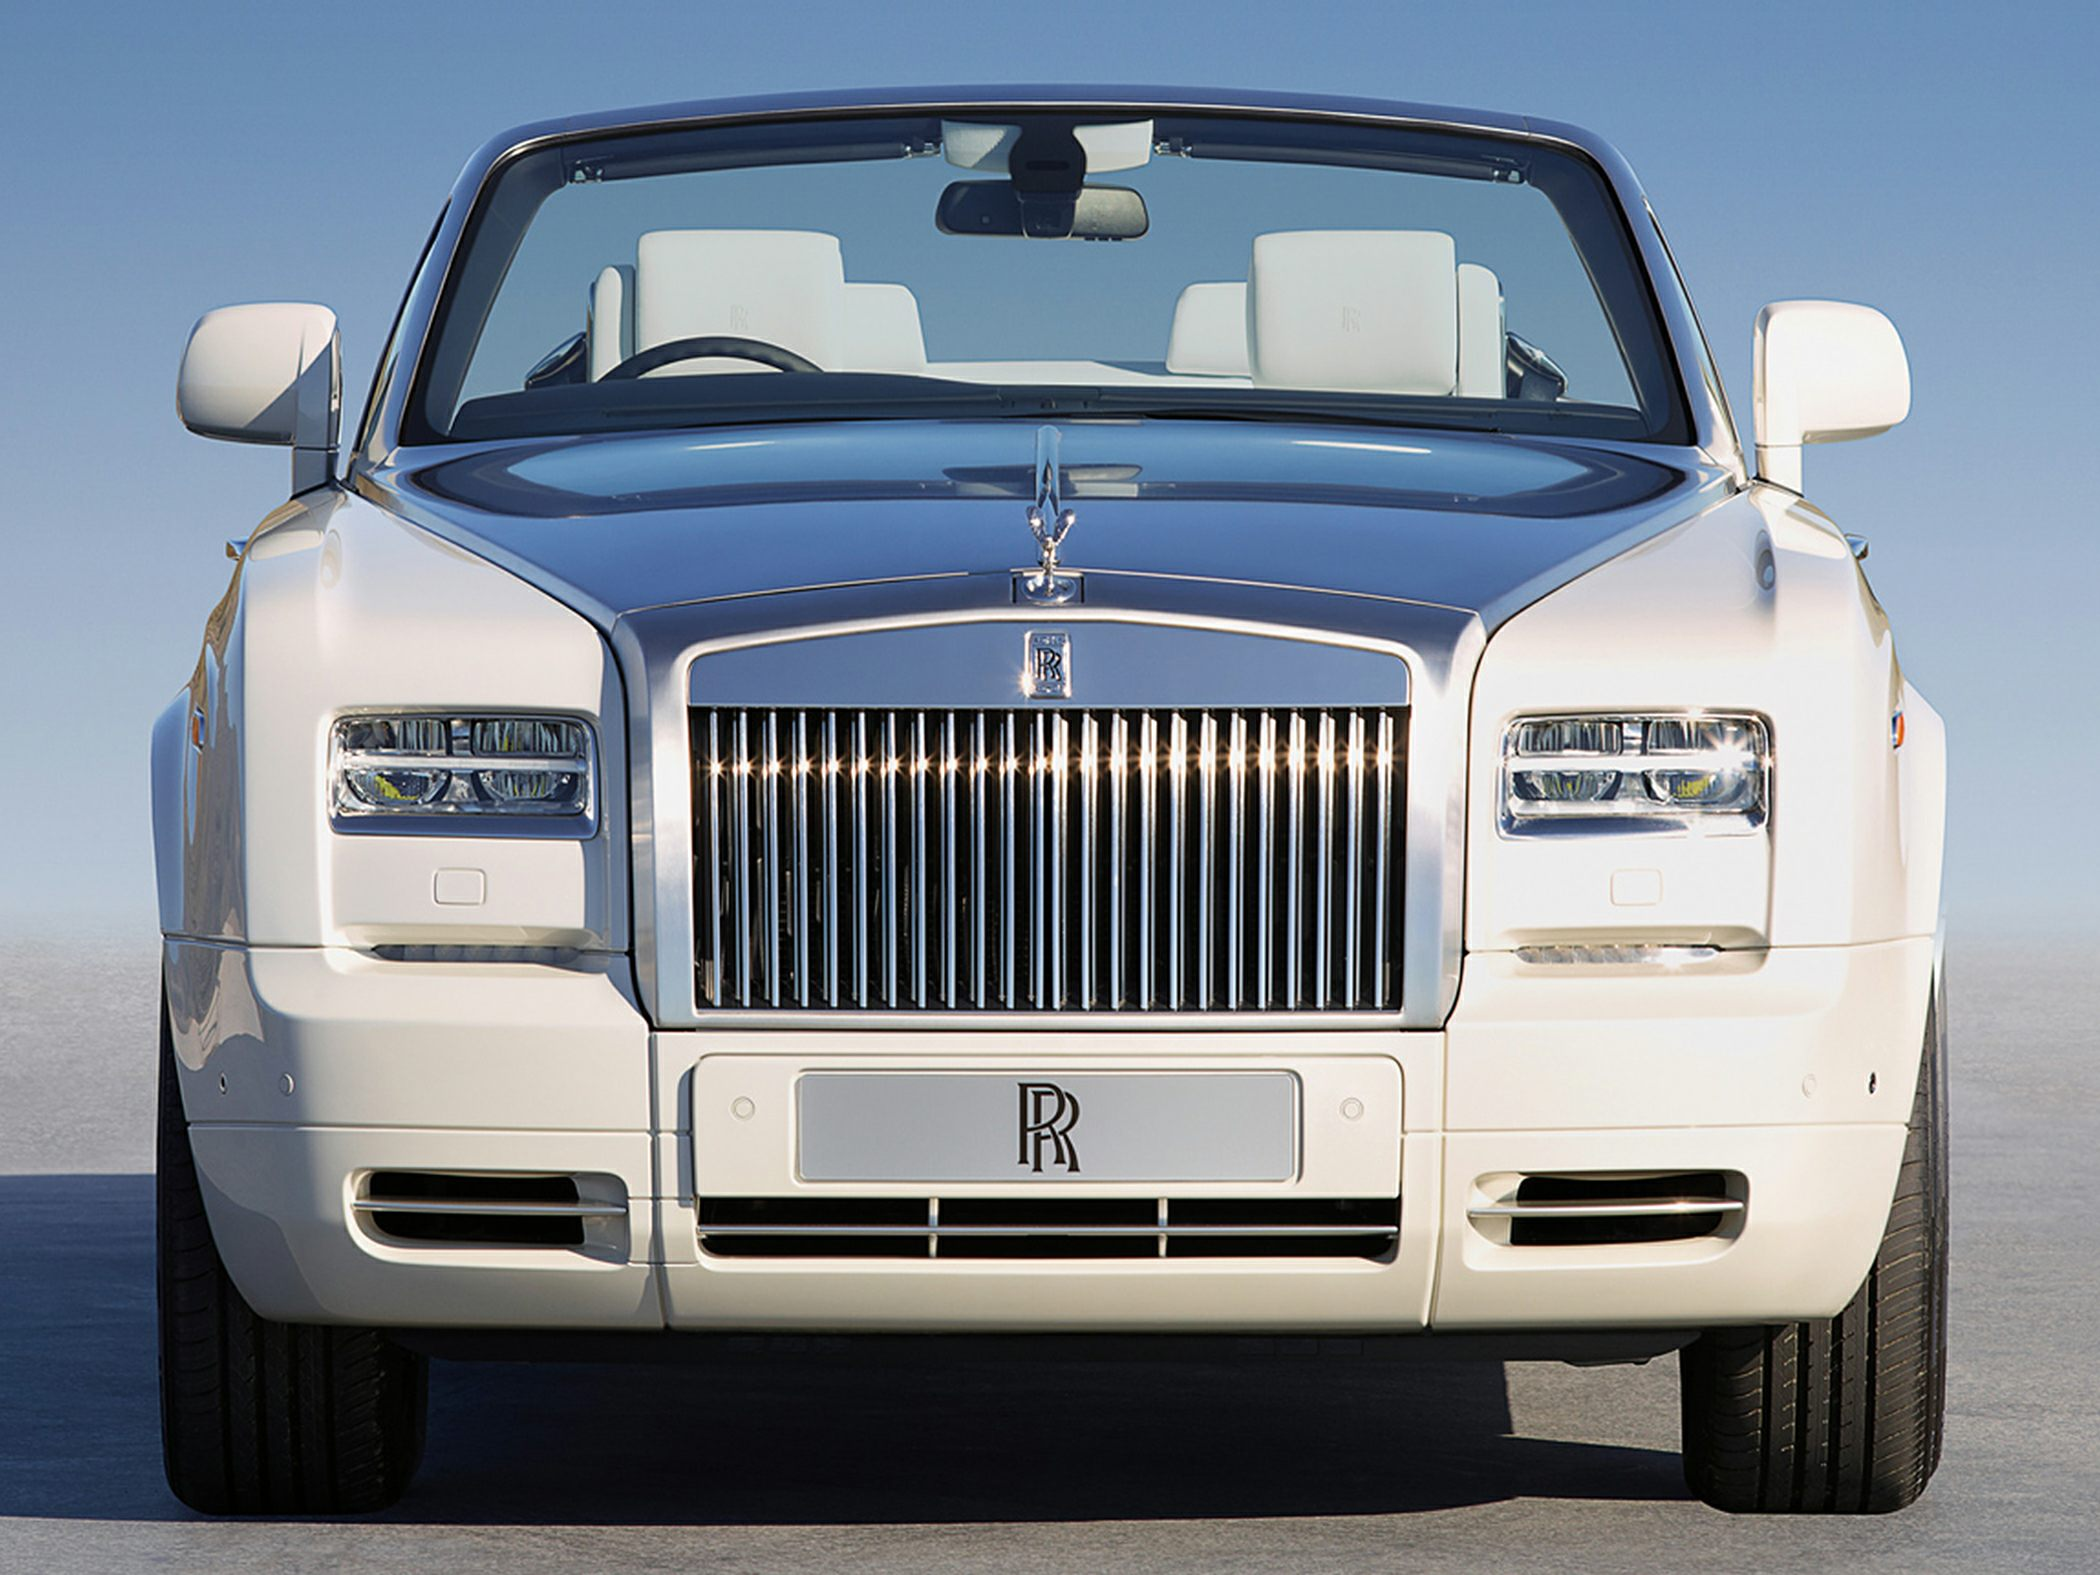 2016 Rolls Royce Phantom Drophead Coupe Pictures